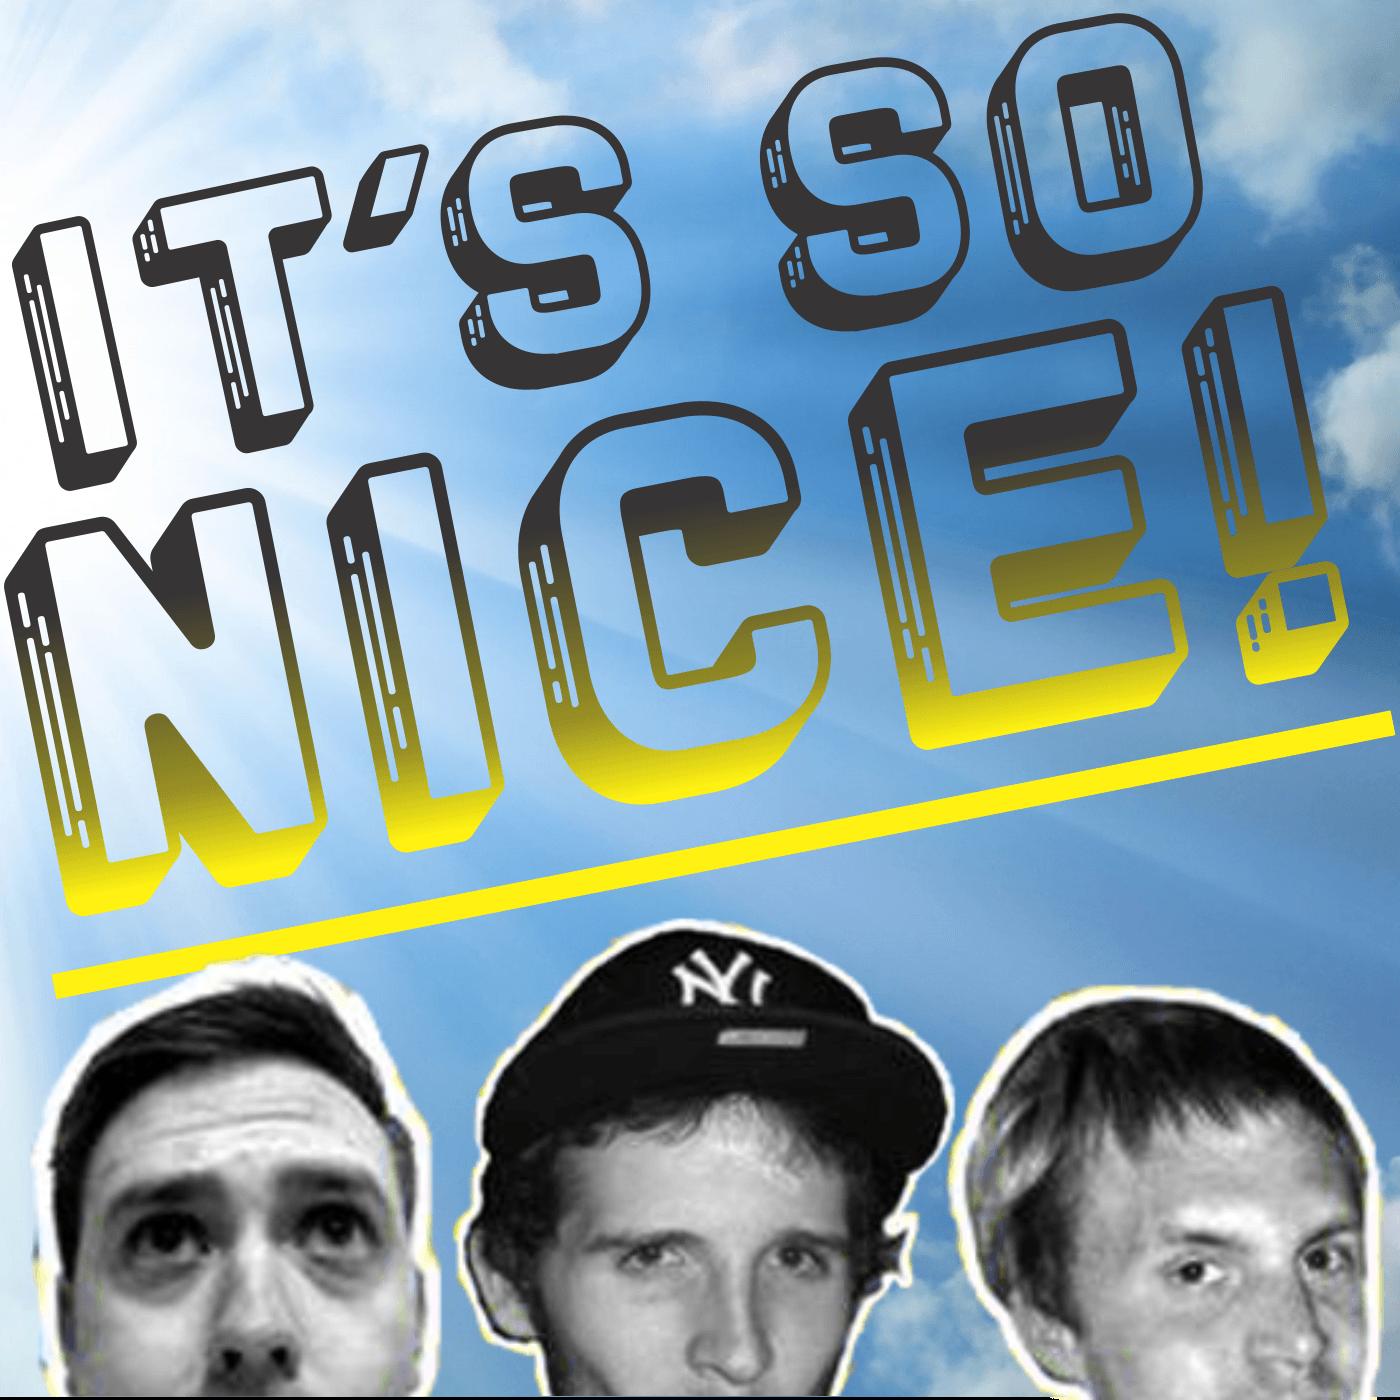 It's So Nice!